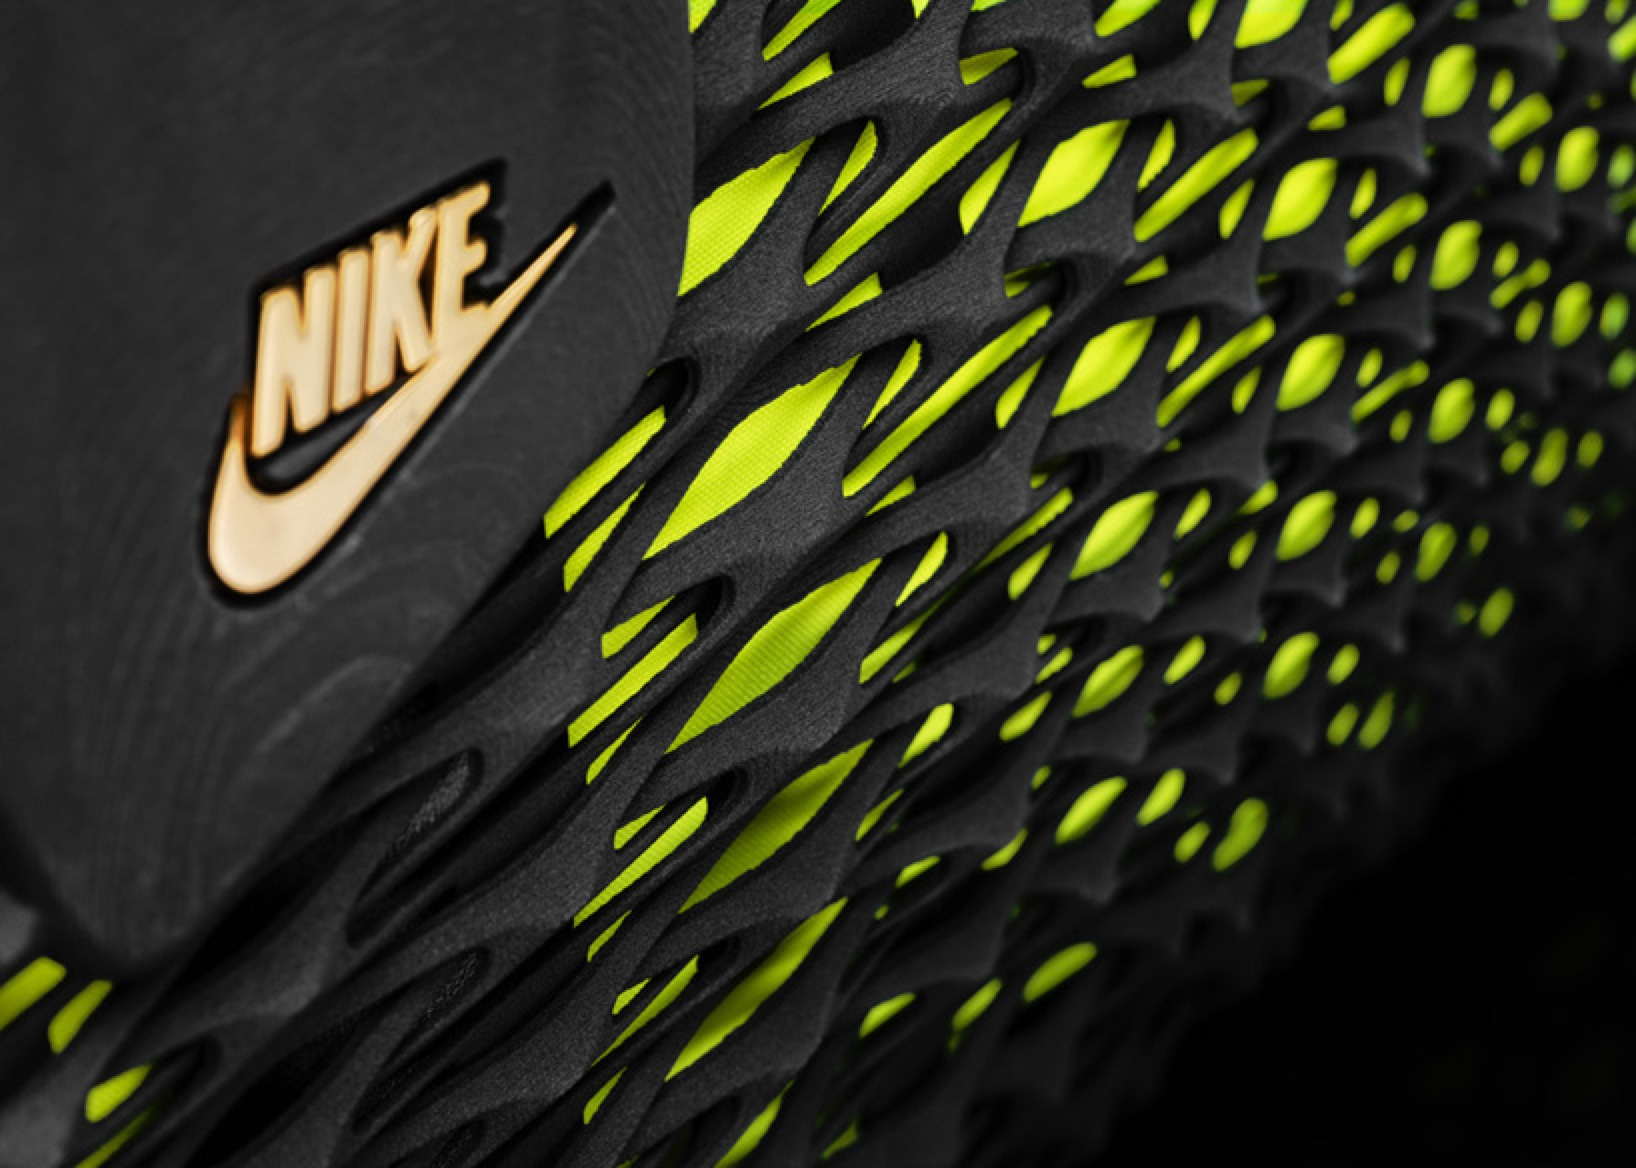 Nike-Rebento-3D-Printed-Bag-Designboom04